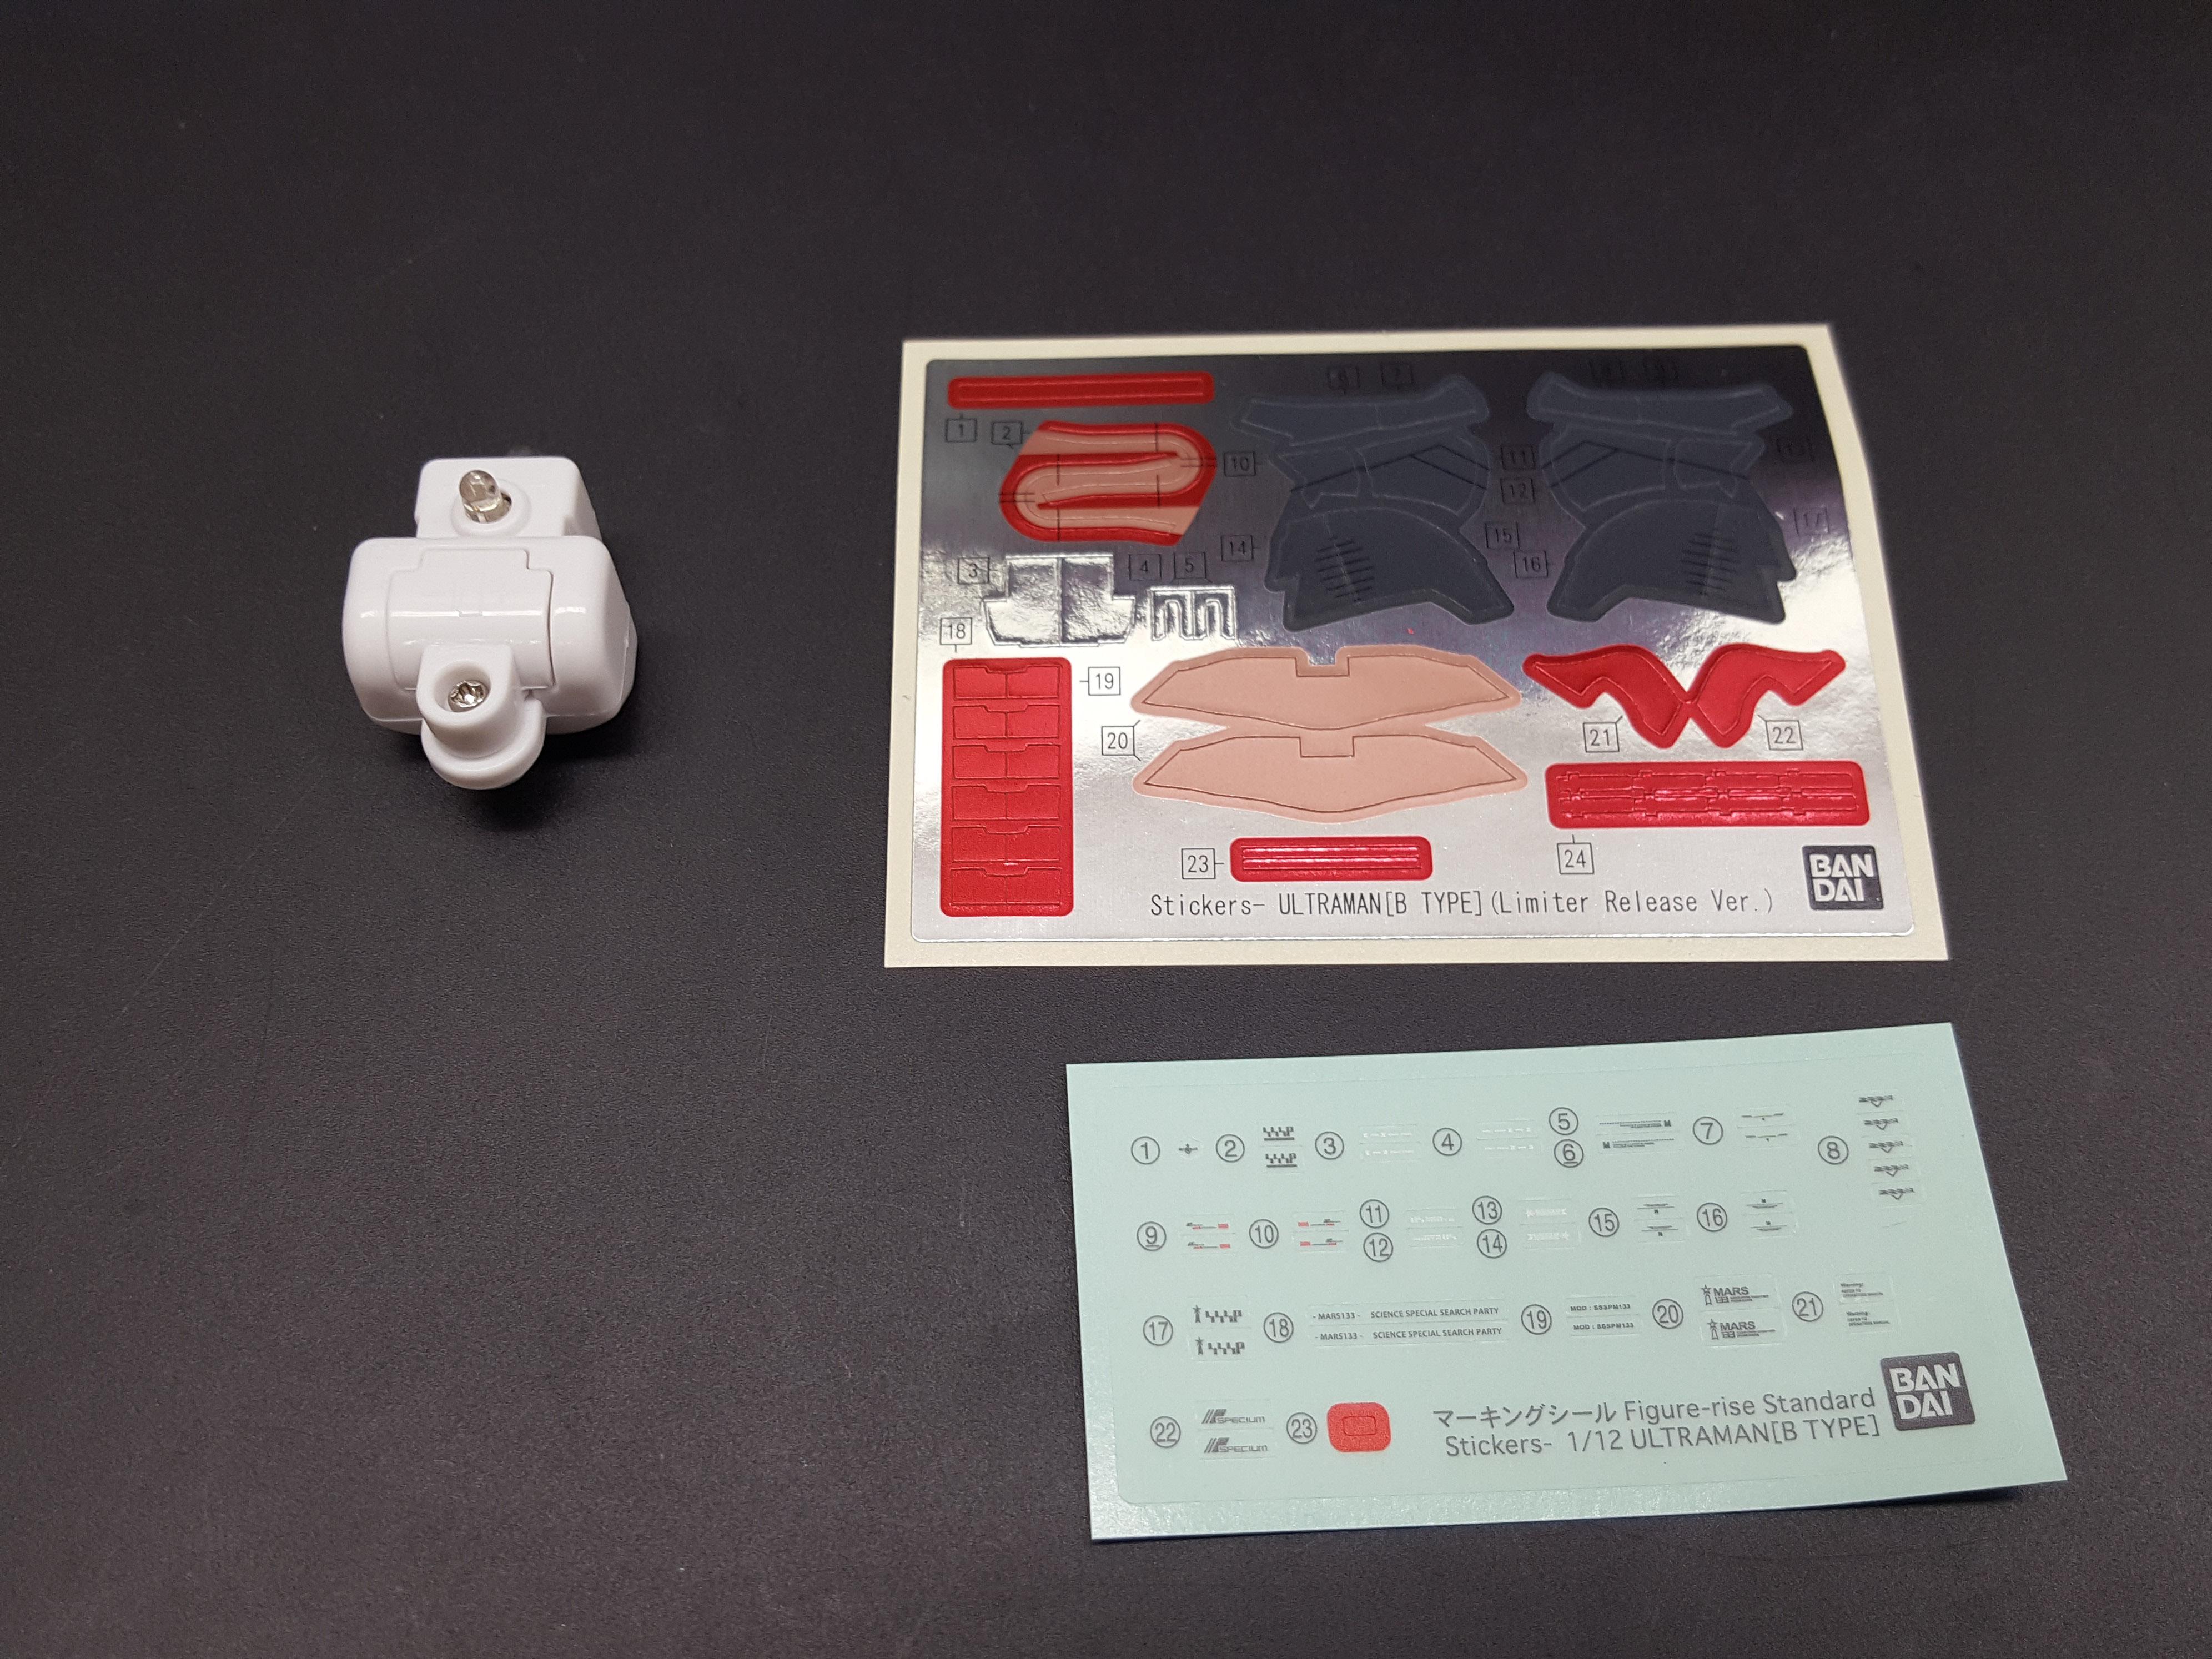 1/12 Figure-rise Standard Ultraman (B Type) (Limiter Release Ver.)